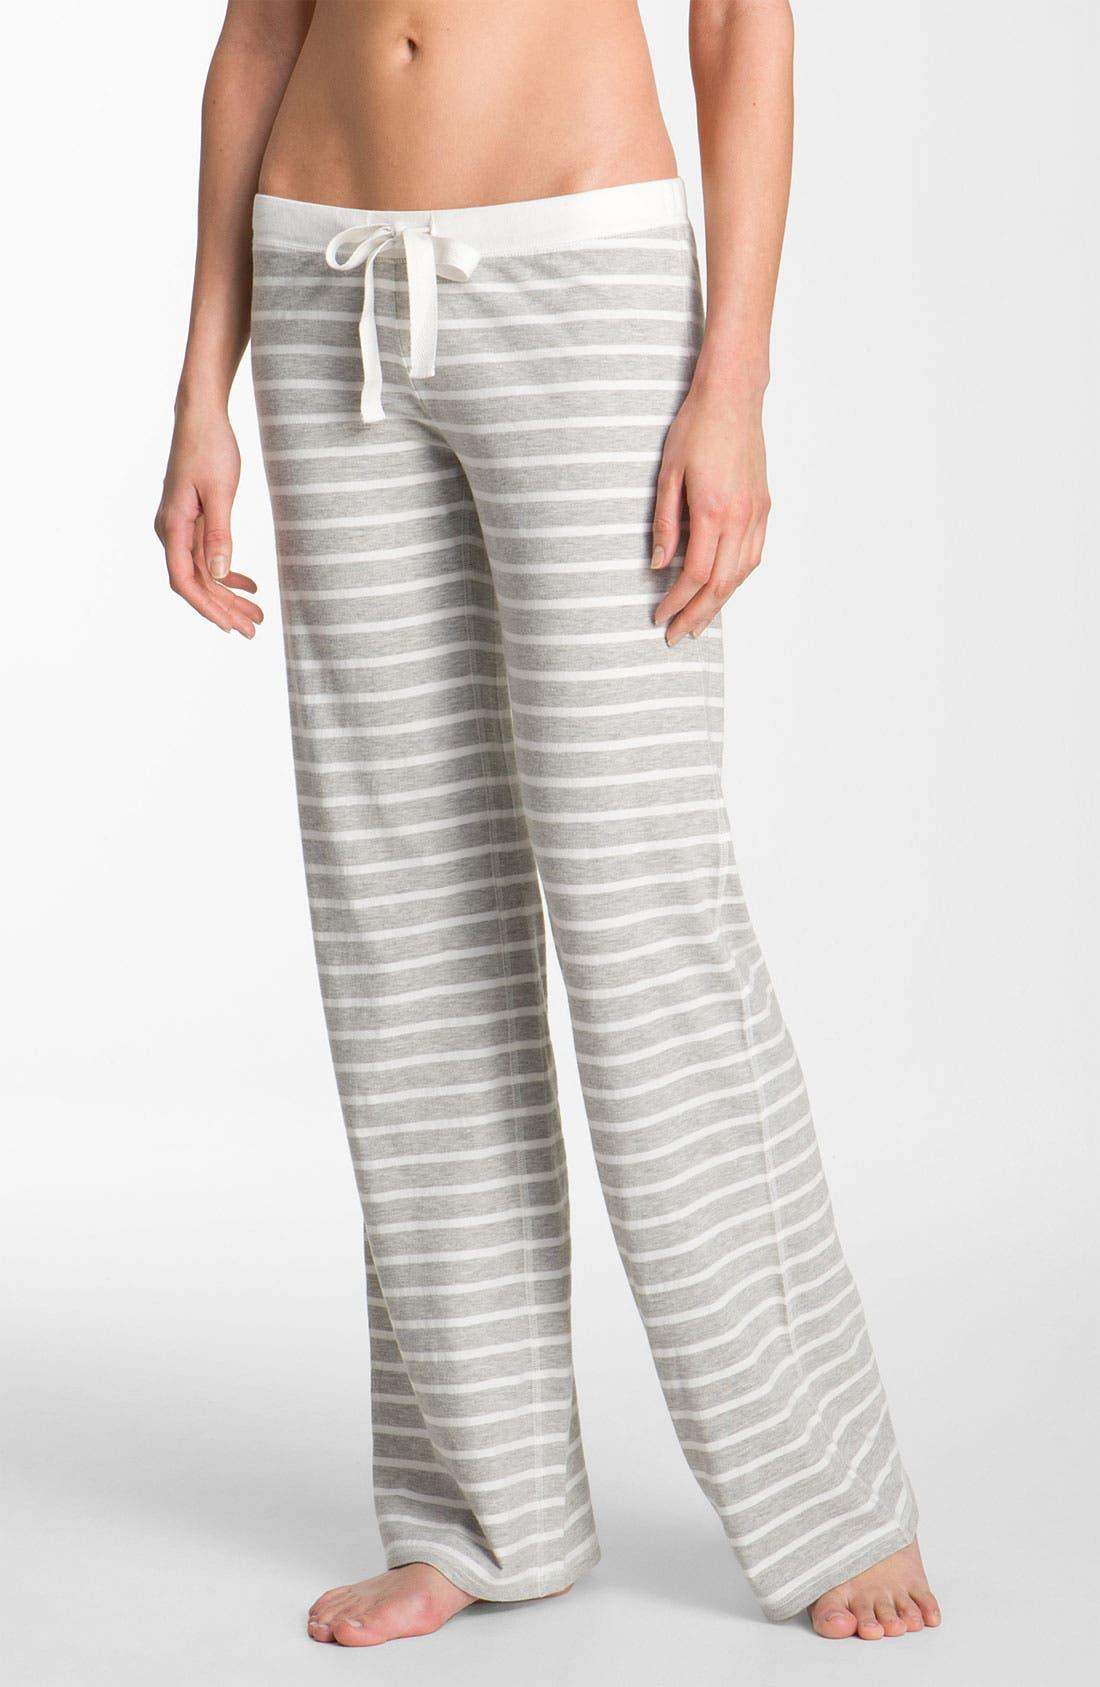 Main Image - Make + Model 'Sleepy Time' Lounge Pants